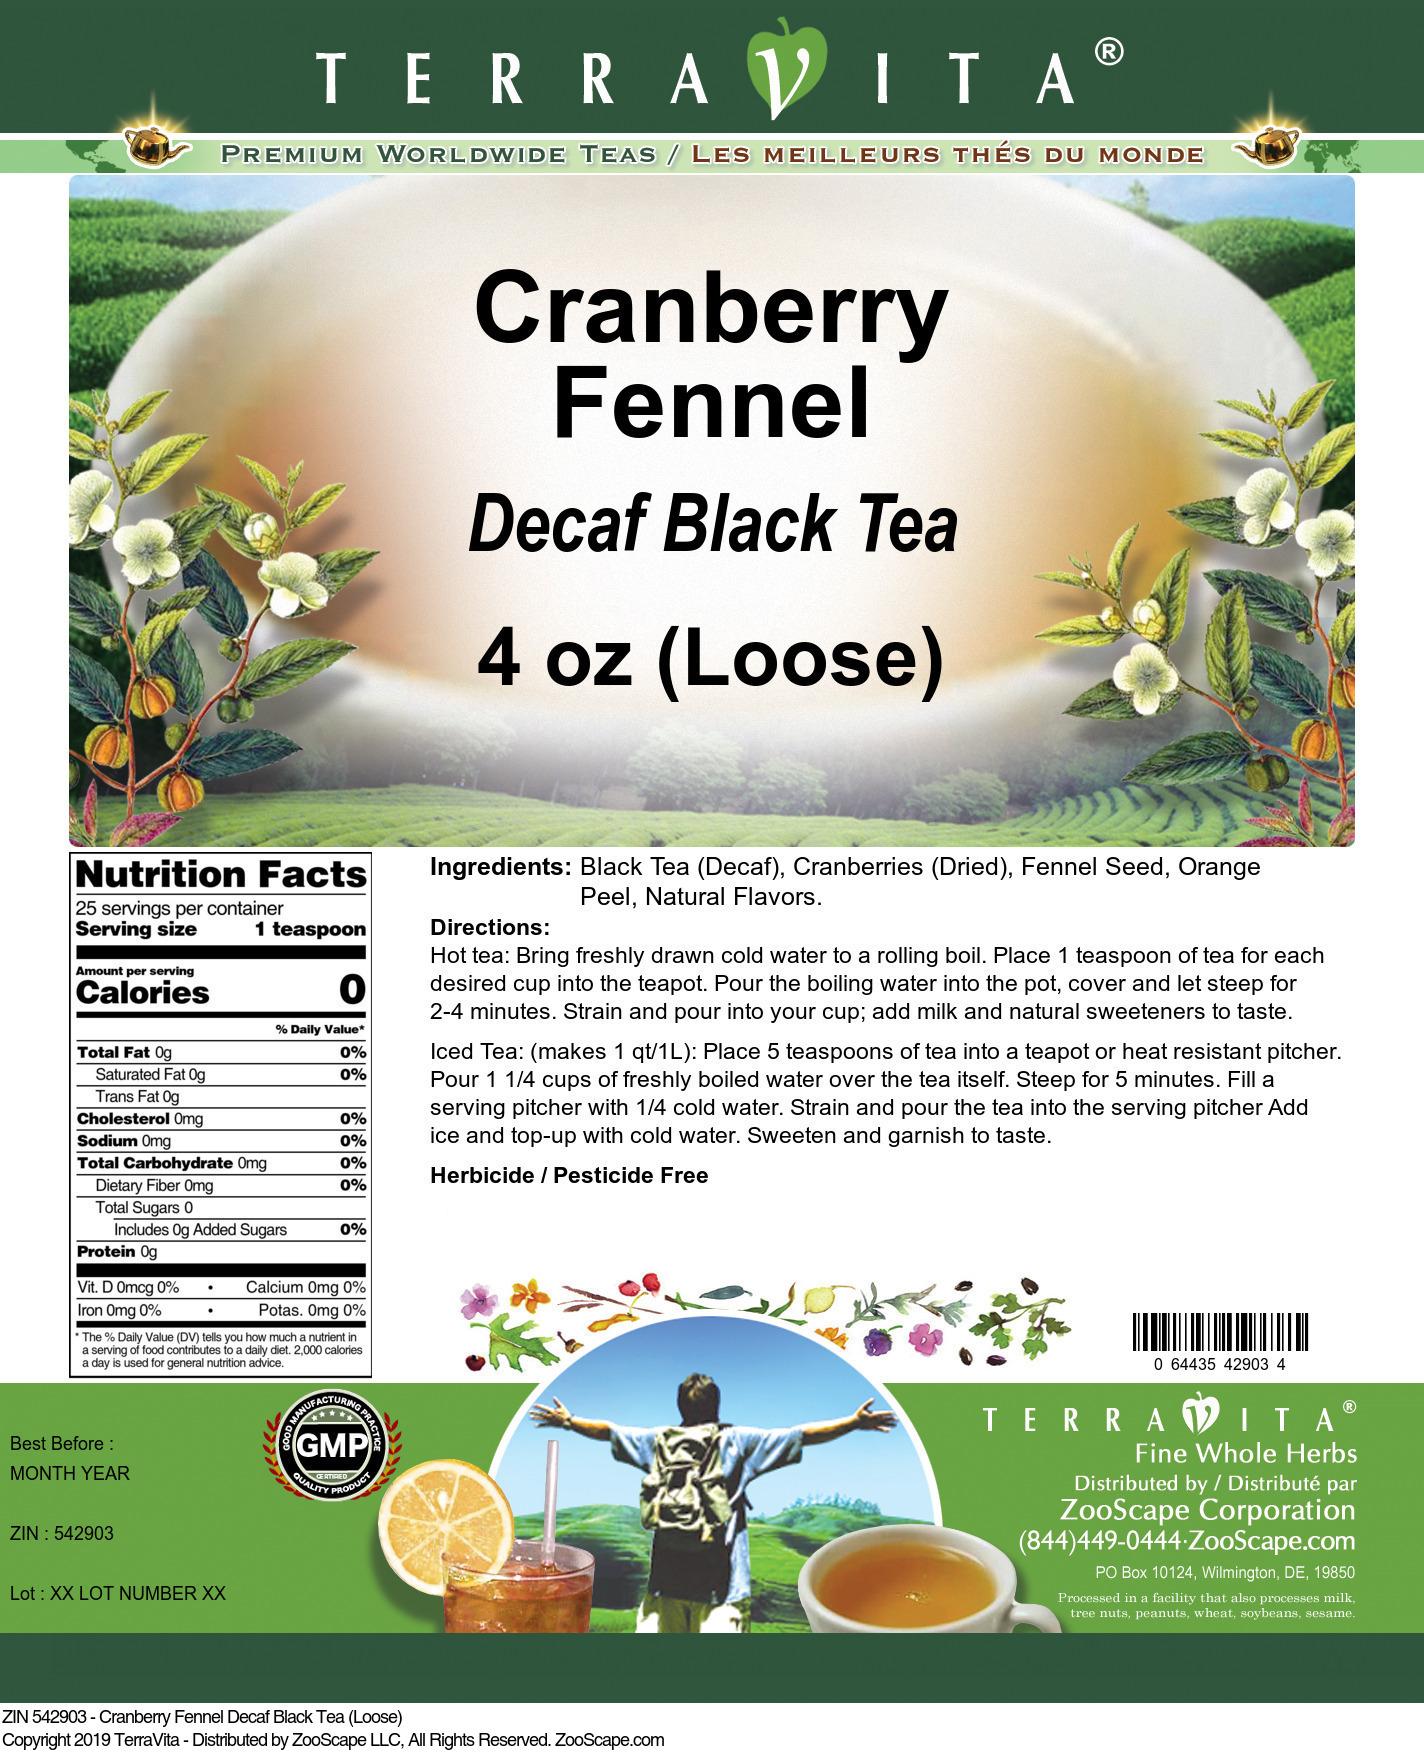 Cranberry Fennel Decaf Black Tea